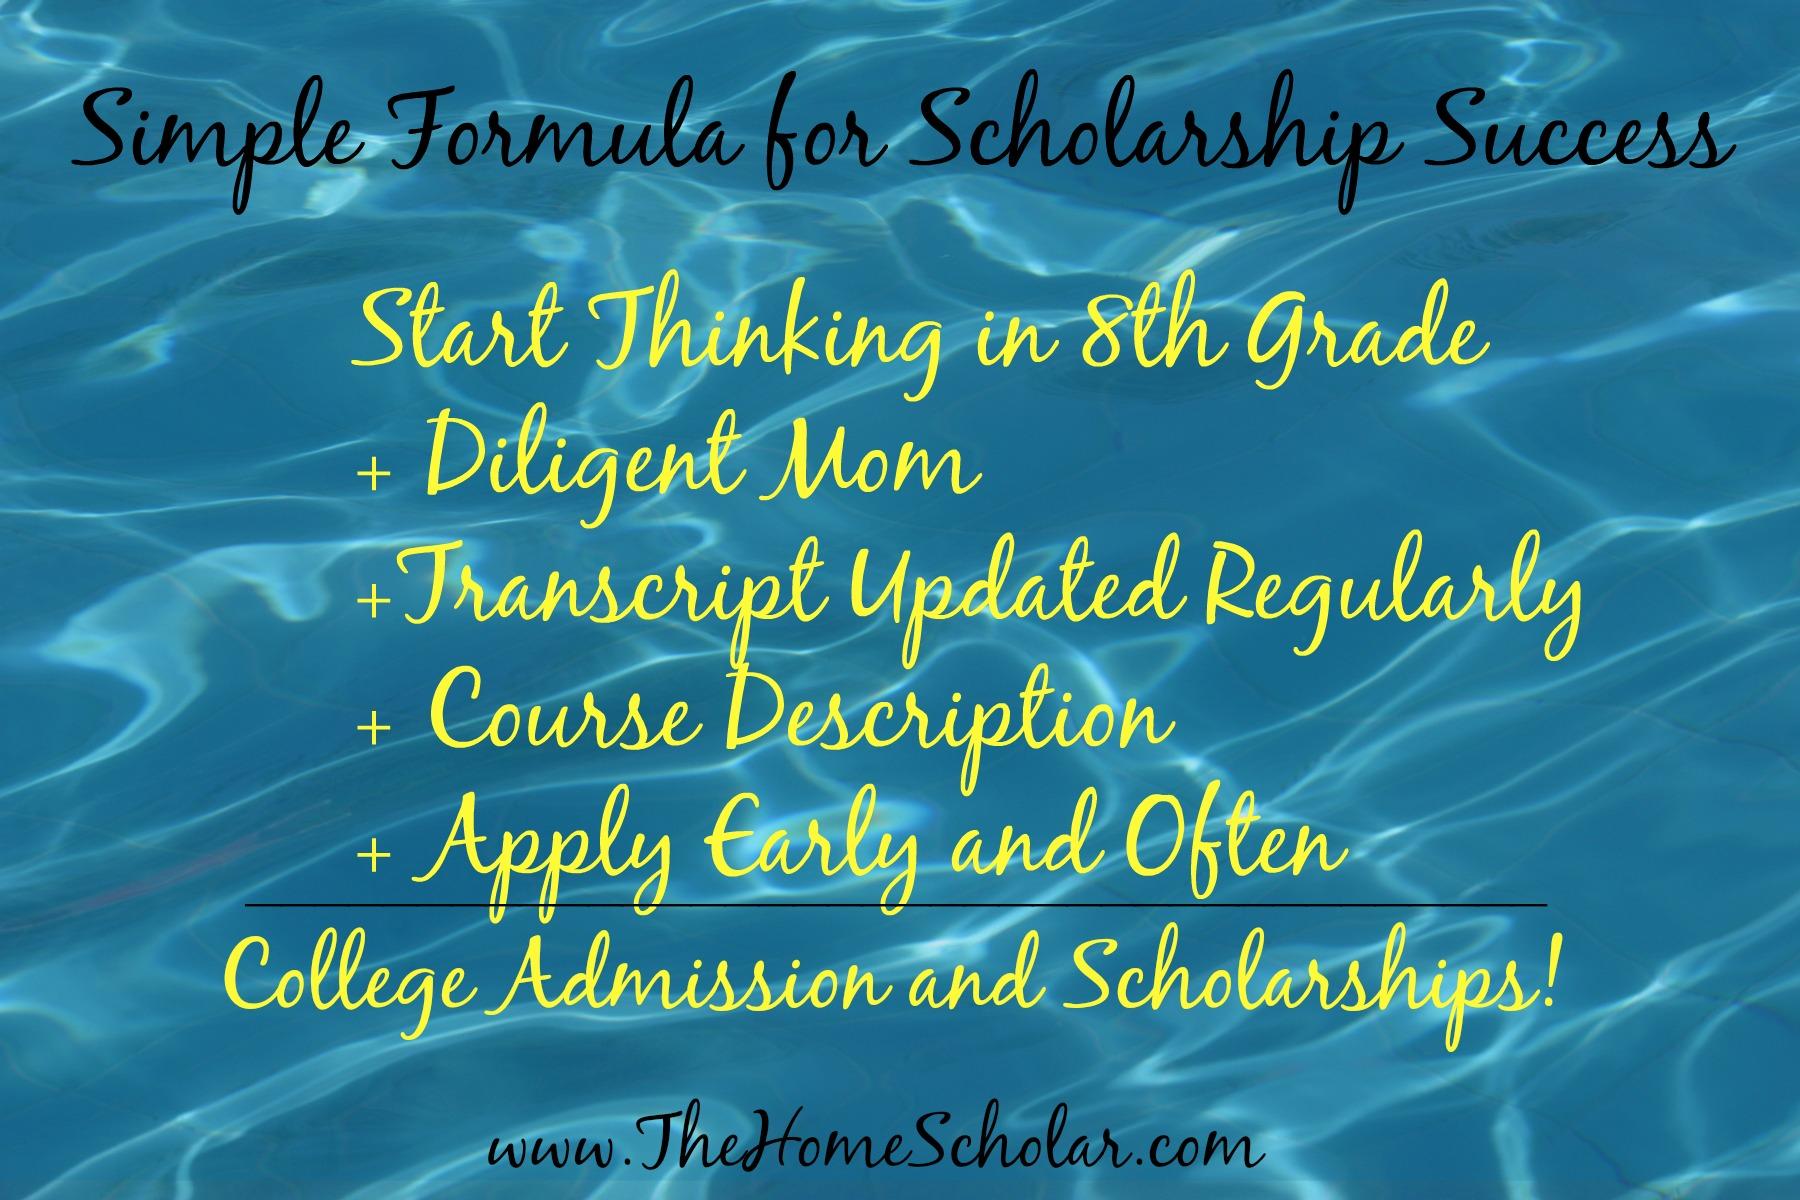 #Simple Formula for Scholarship Success @TheHomeScholar